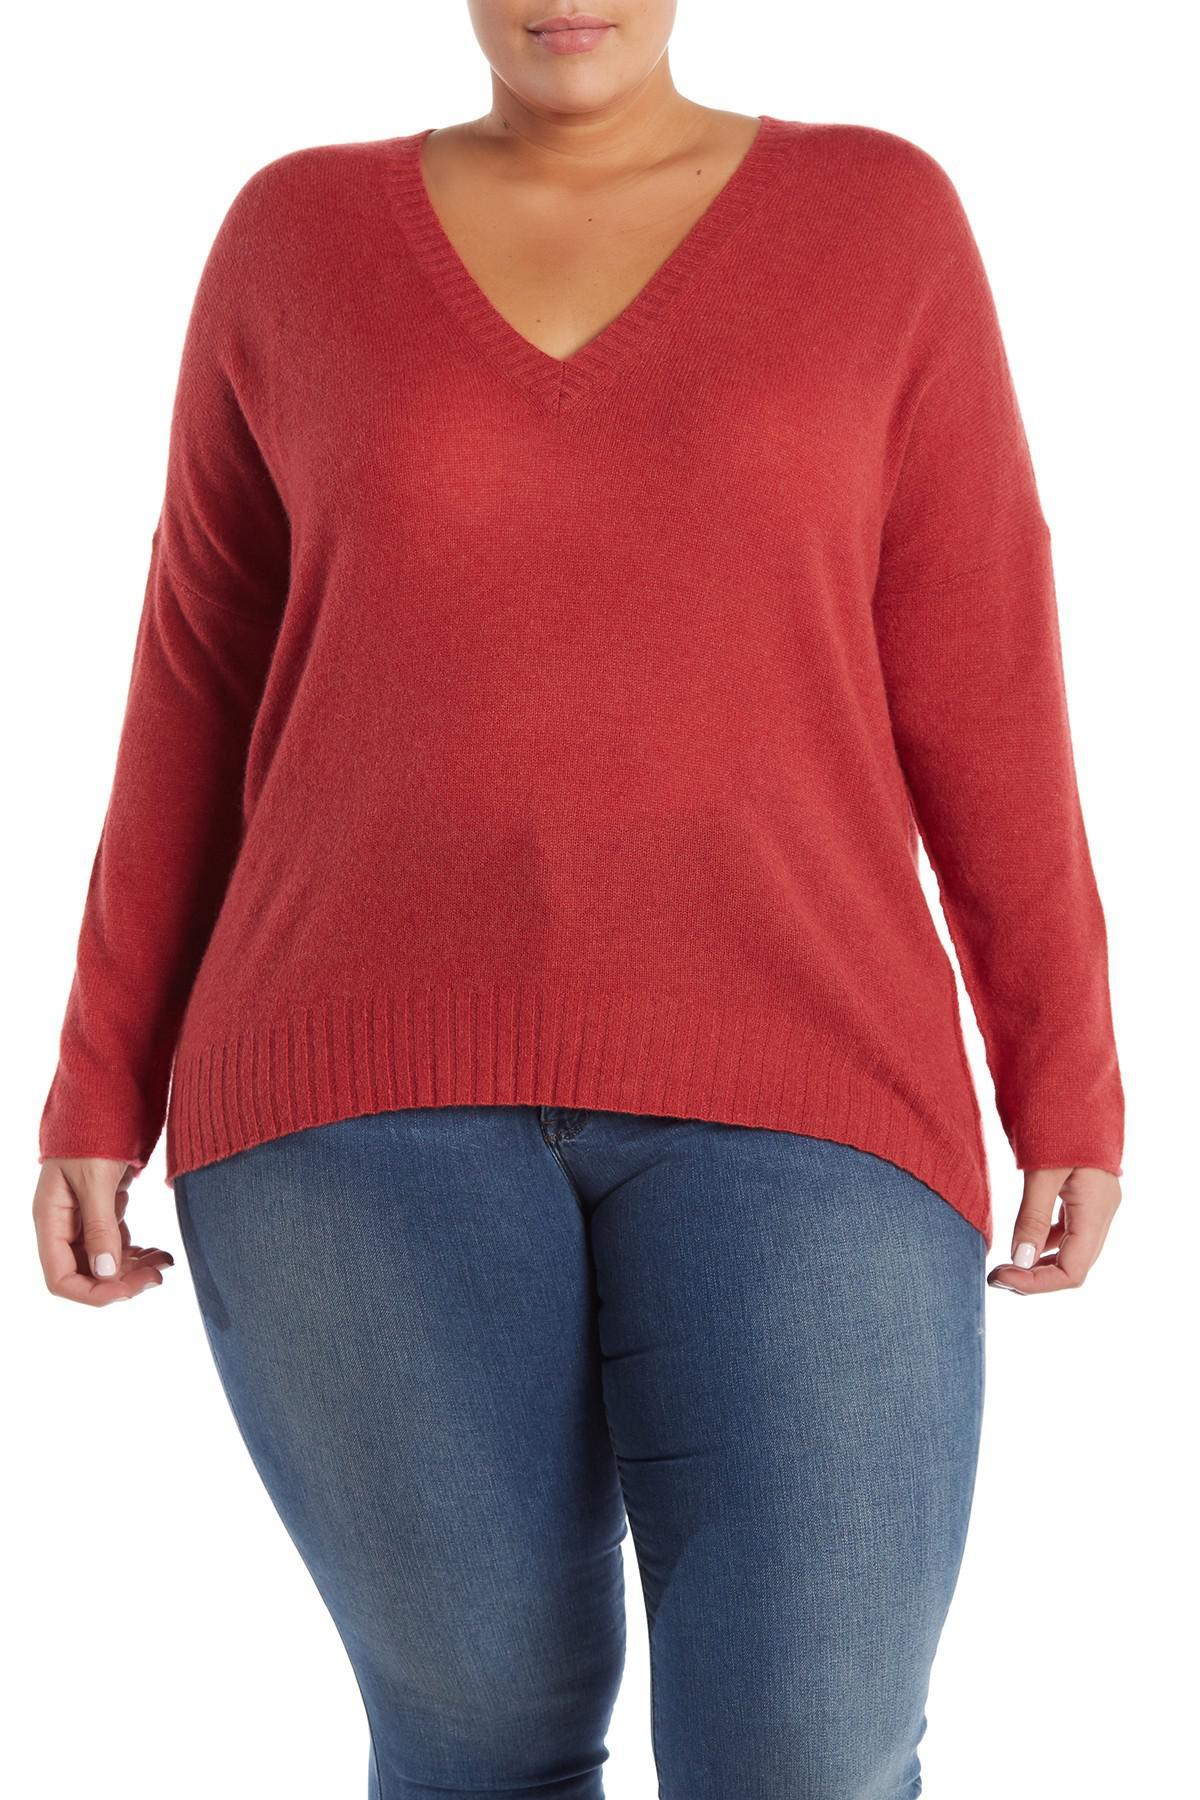 effc6180eab Lyst - NAKEDCASHMERE Skyler V-neck Cashmere Pullover (plus Size) in Red